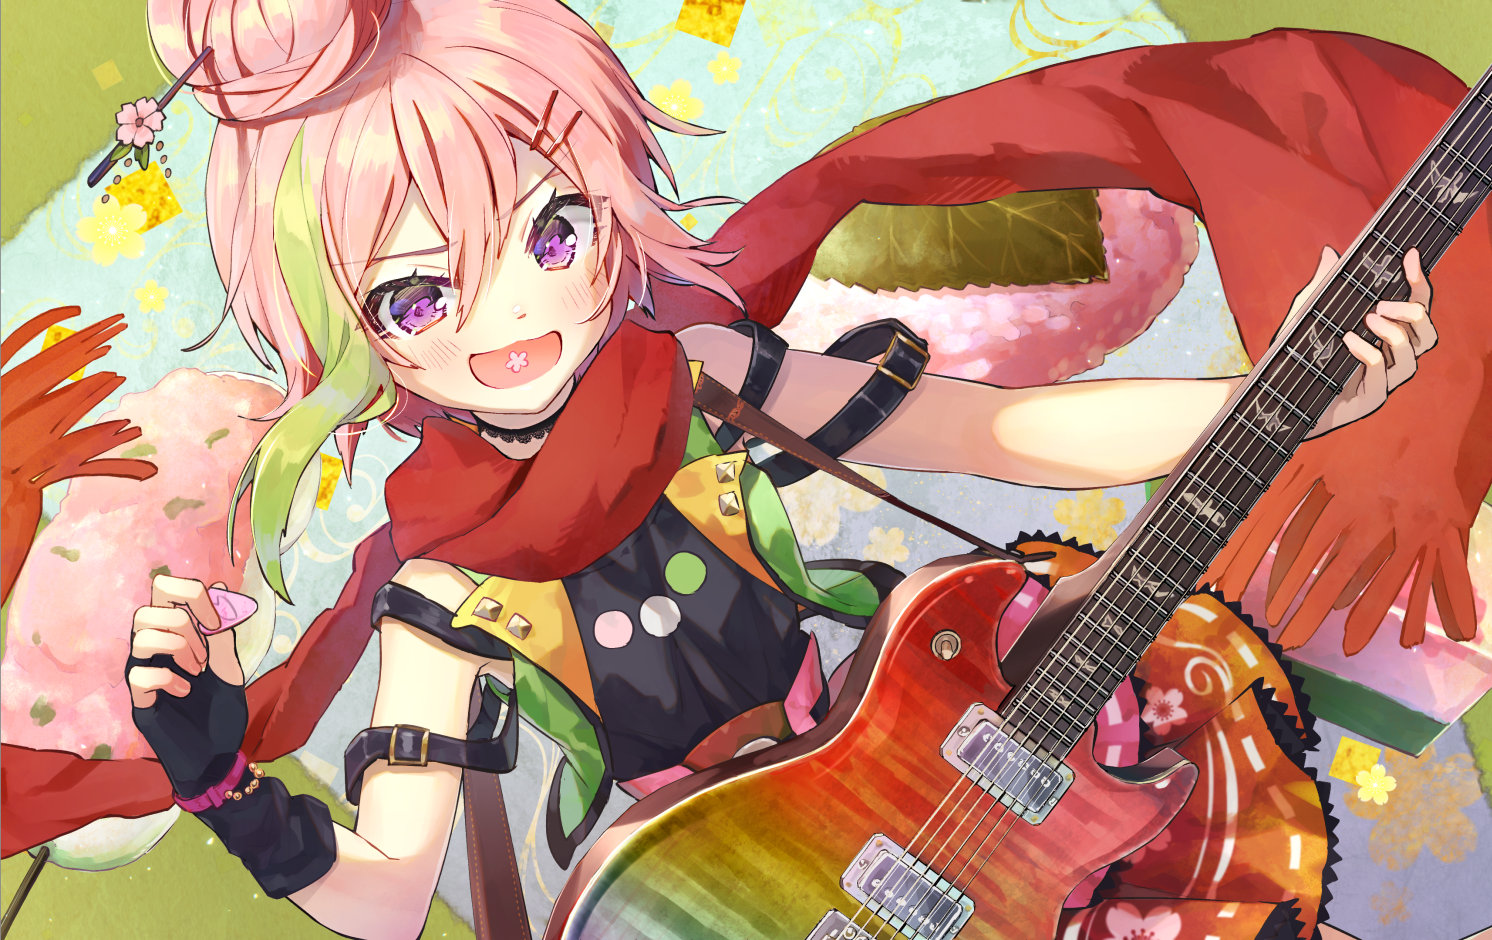 blush elbow_gloves gloves guitar instrument pink_hair purple_eyes sakuramochi_maho scarf short_hair syuri22